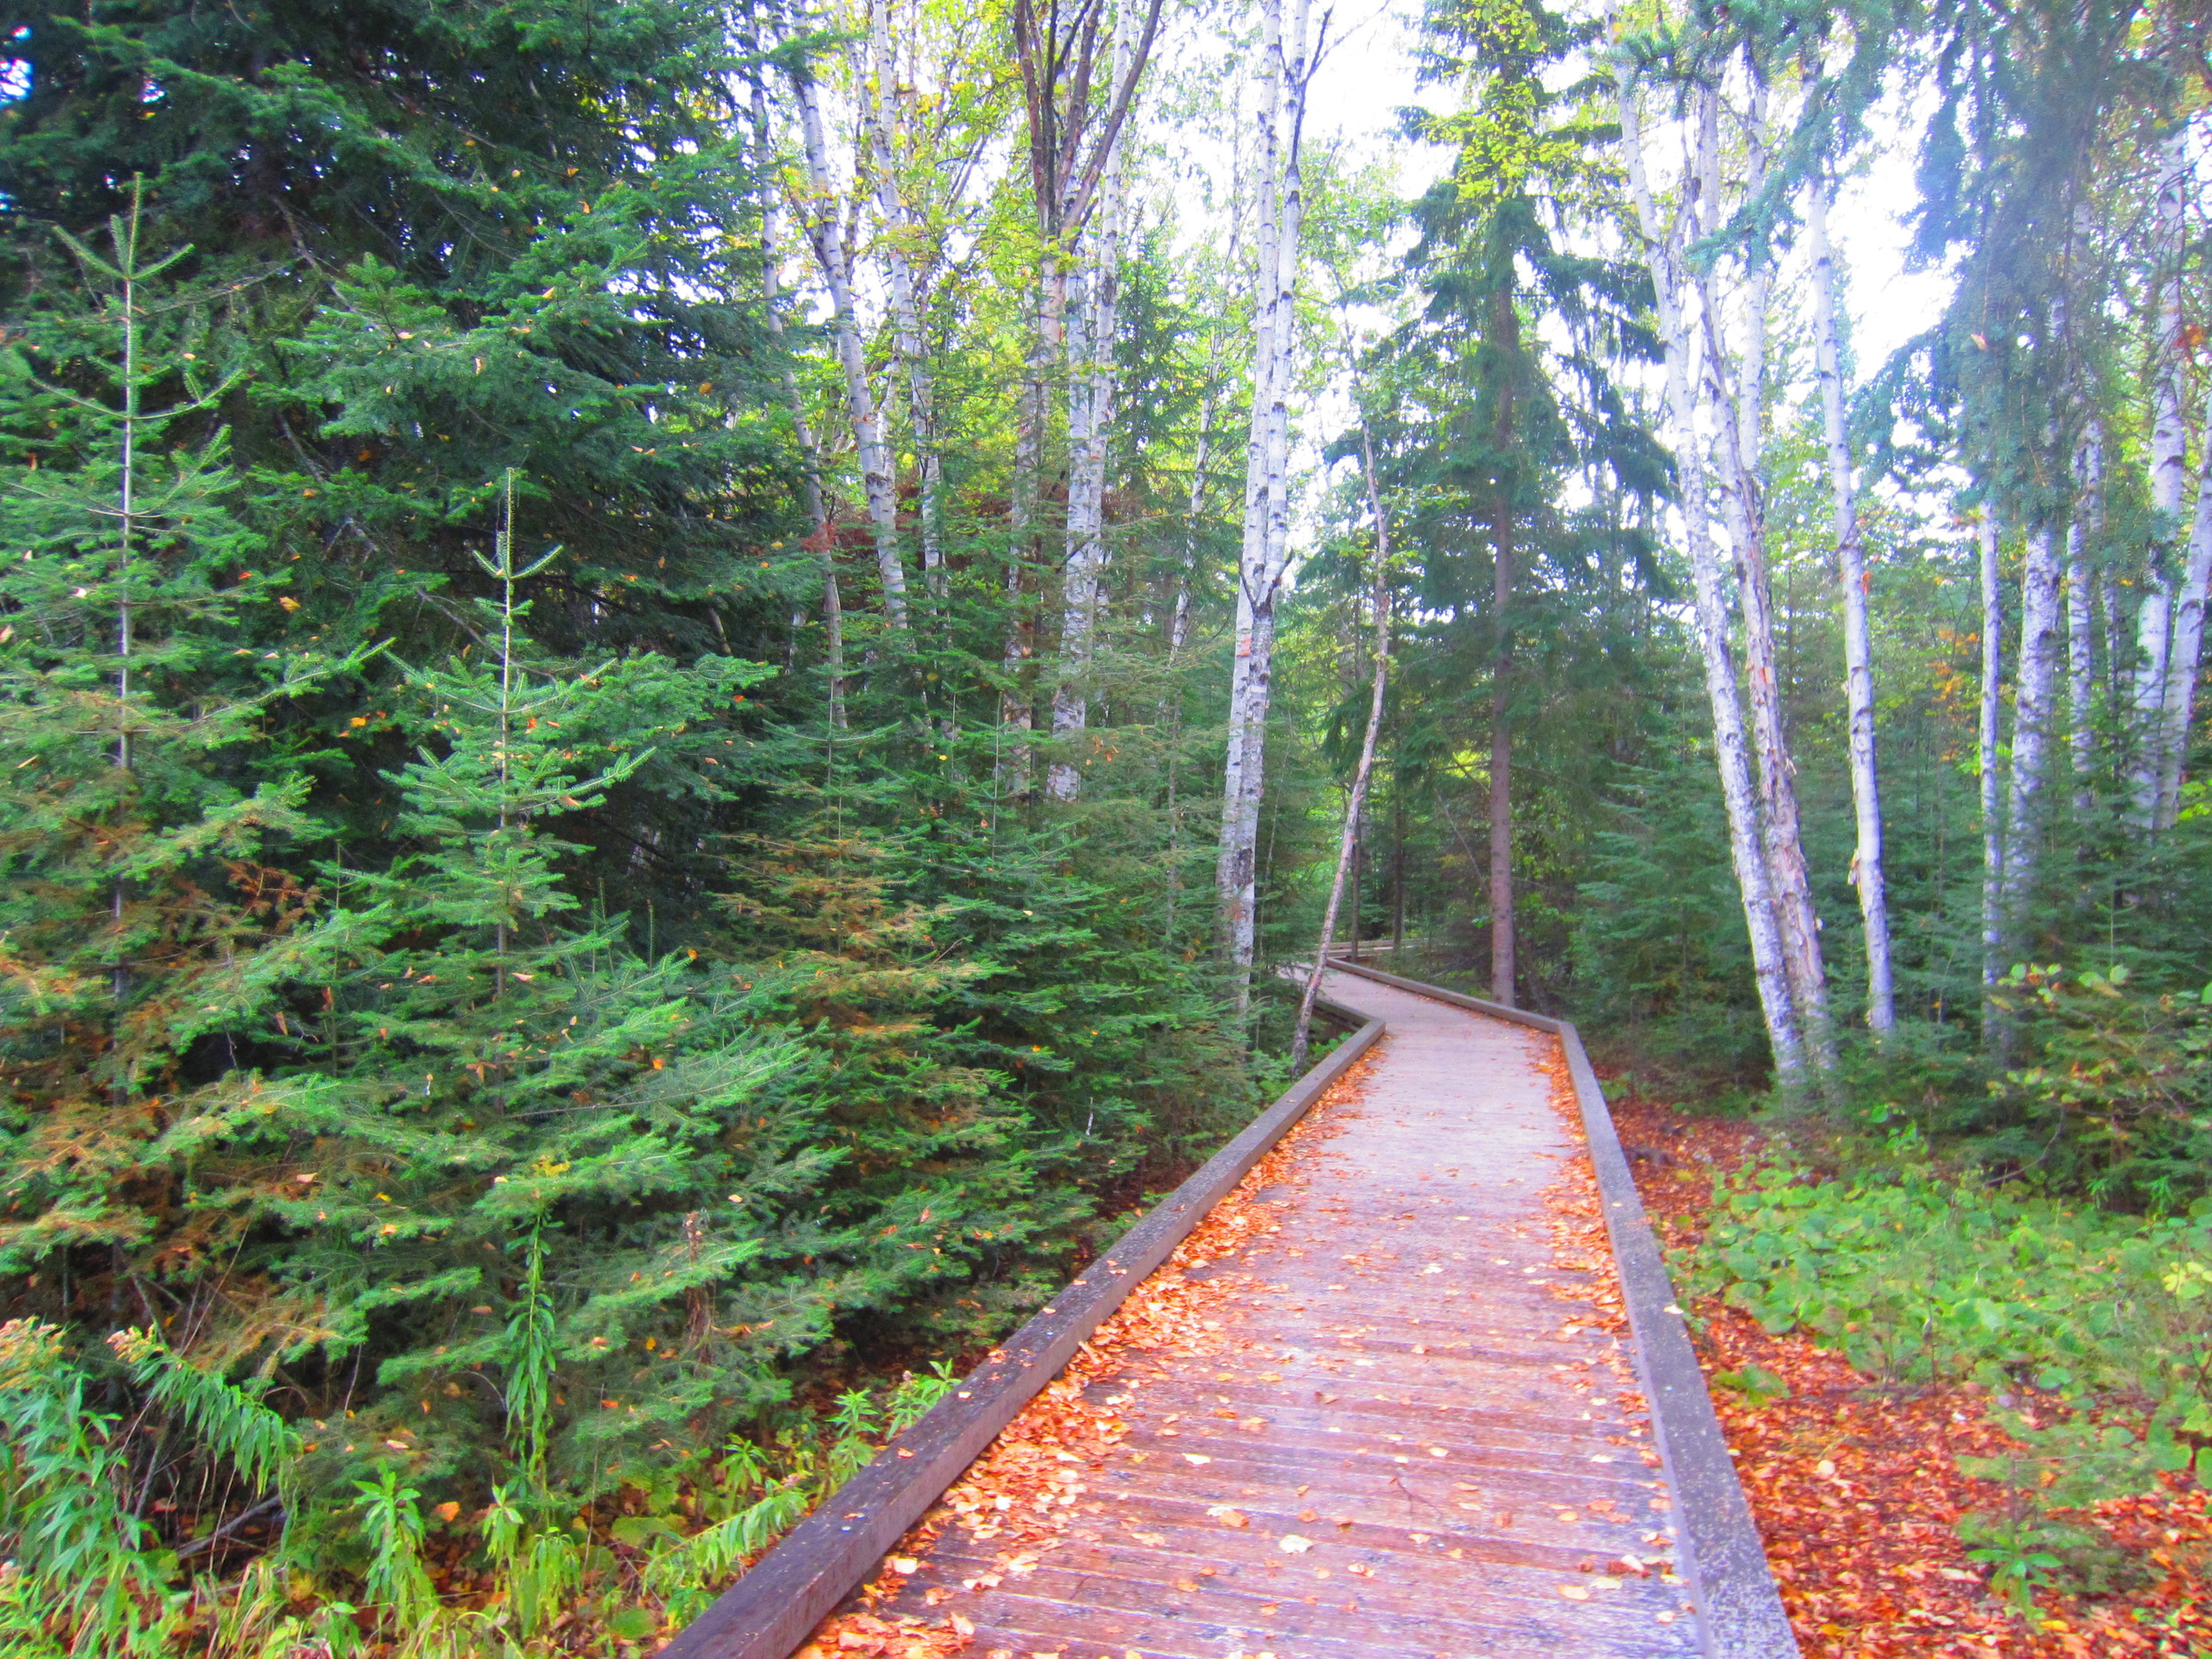 Boardwalk at Grand Portage State Park